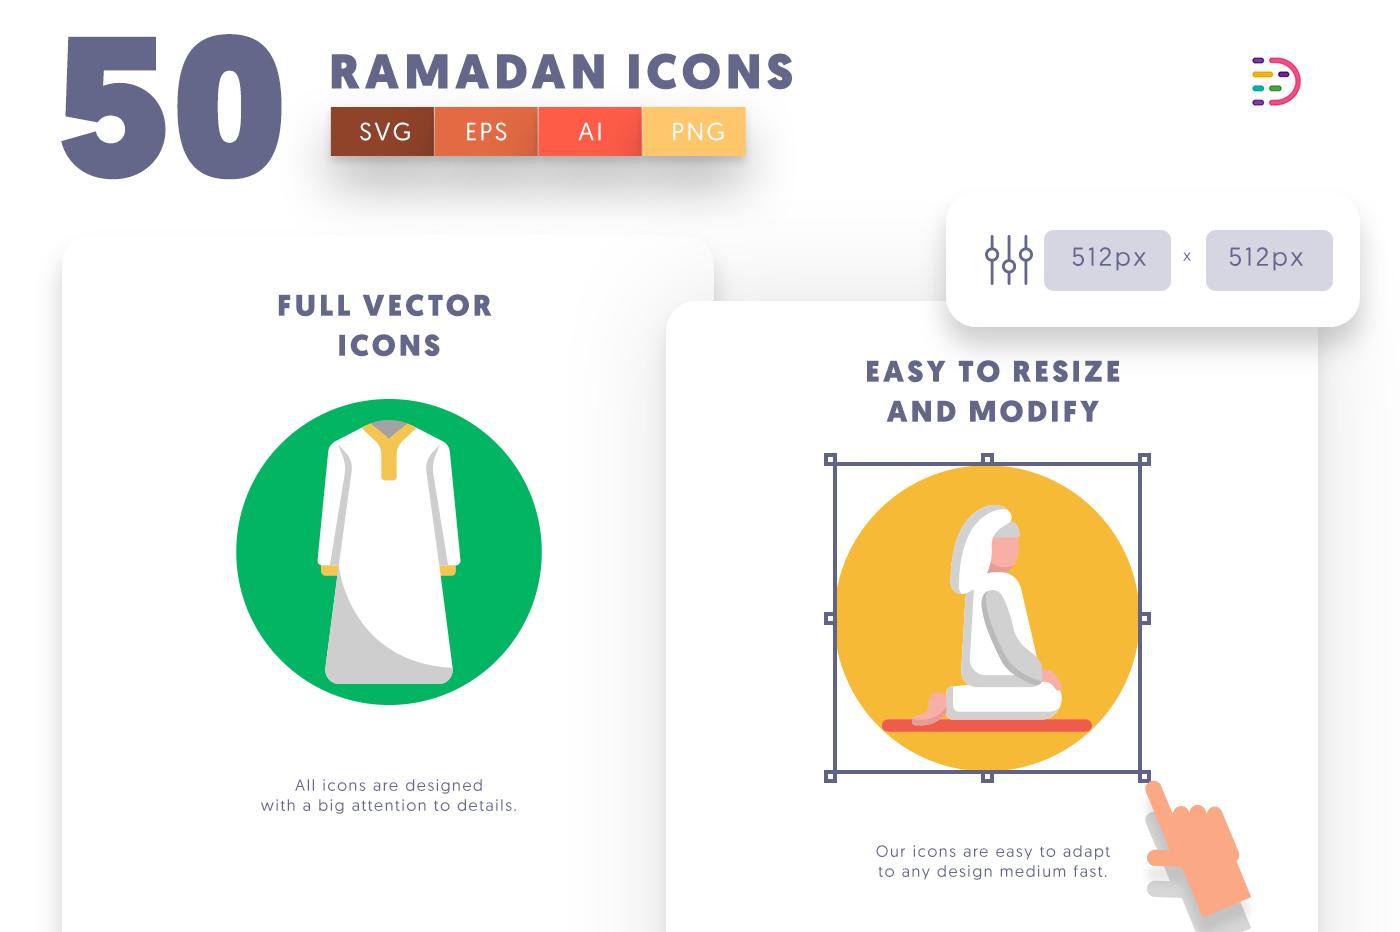 Full vector 50Ramadan Icons